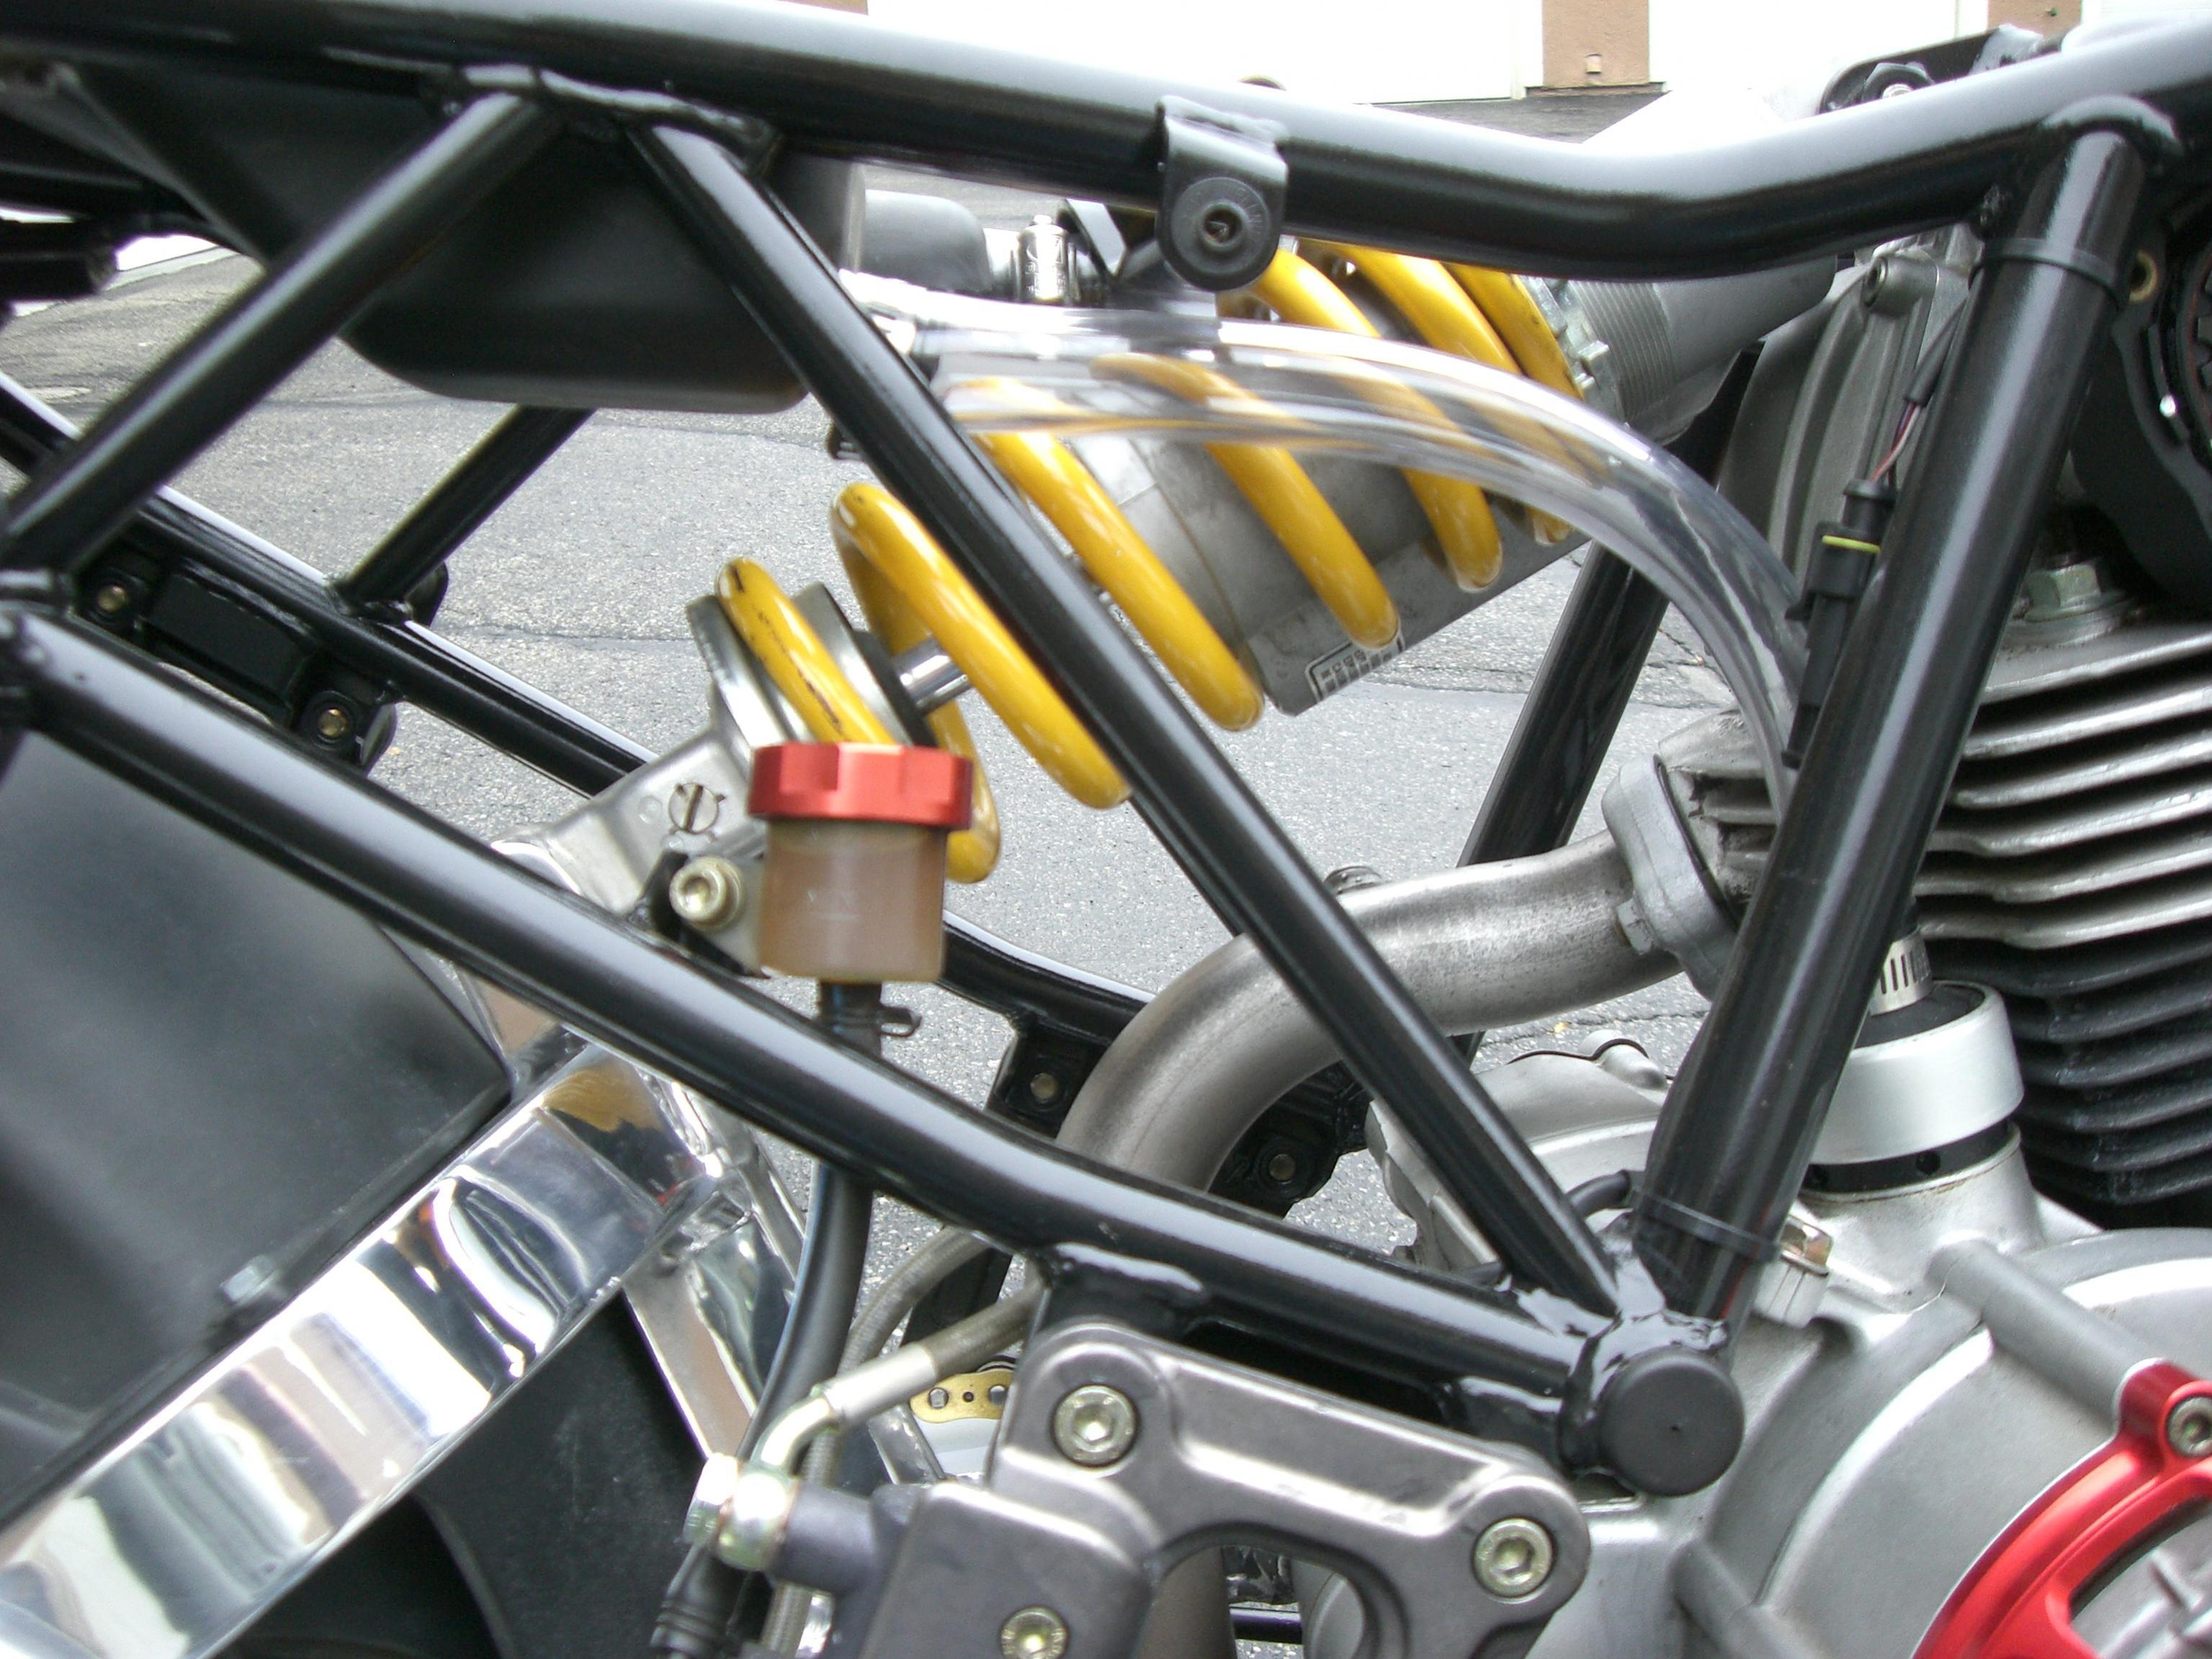 Crankcase breather hose mod  - Page 3 - Ducati ms - The Ultimate